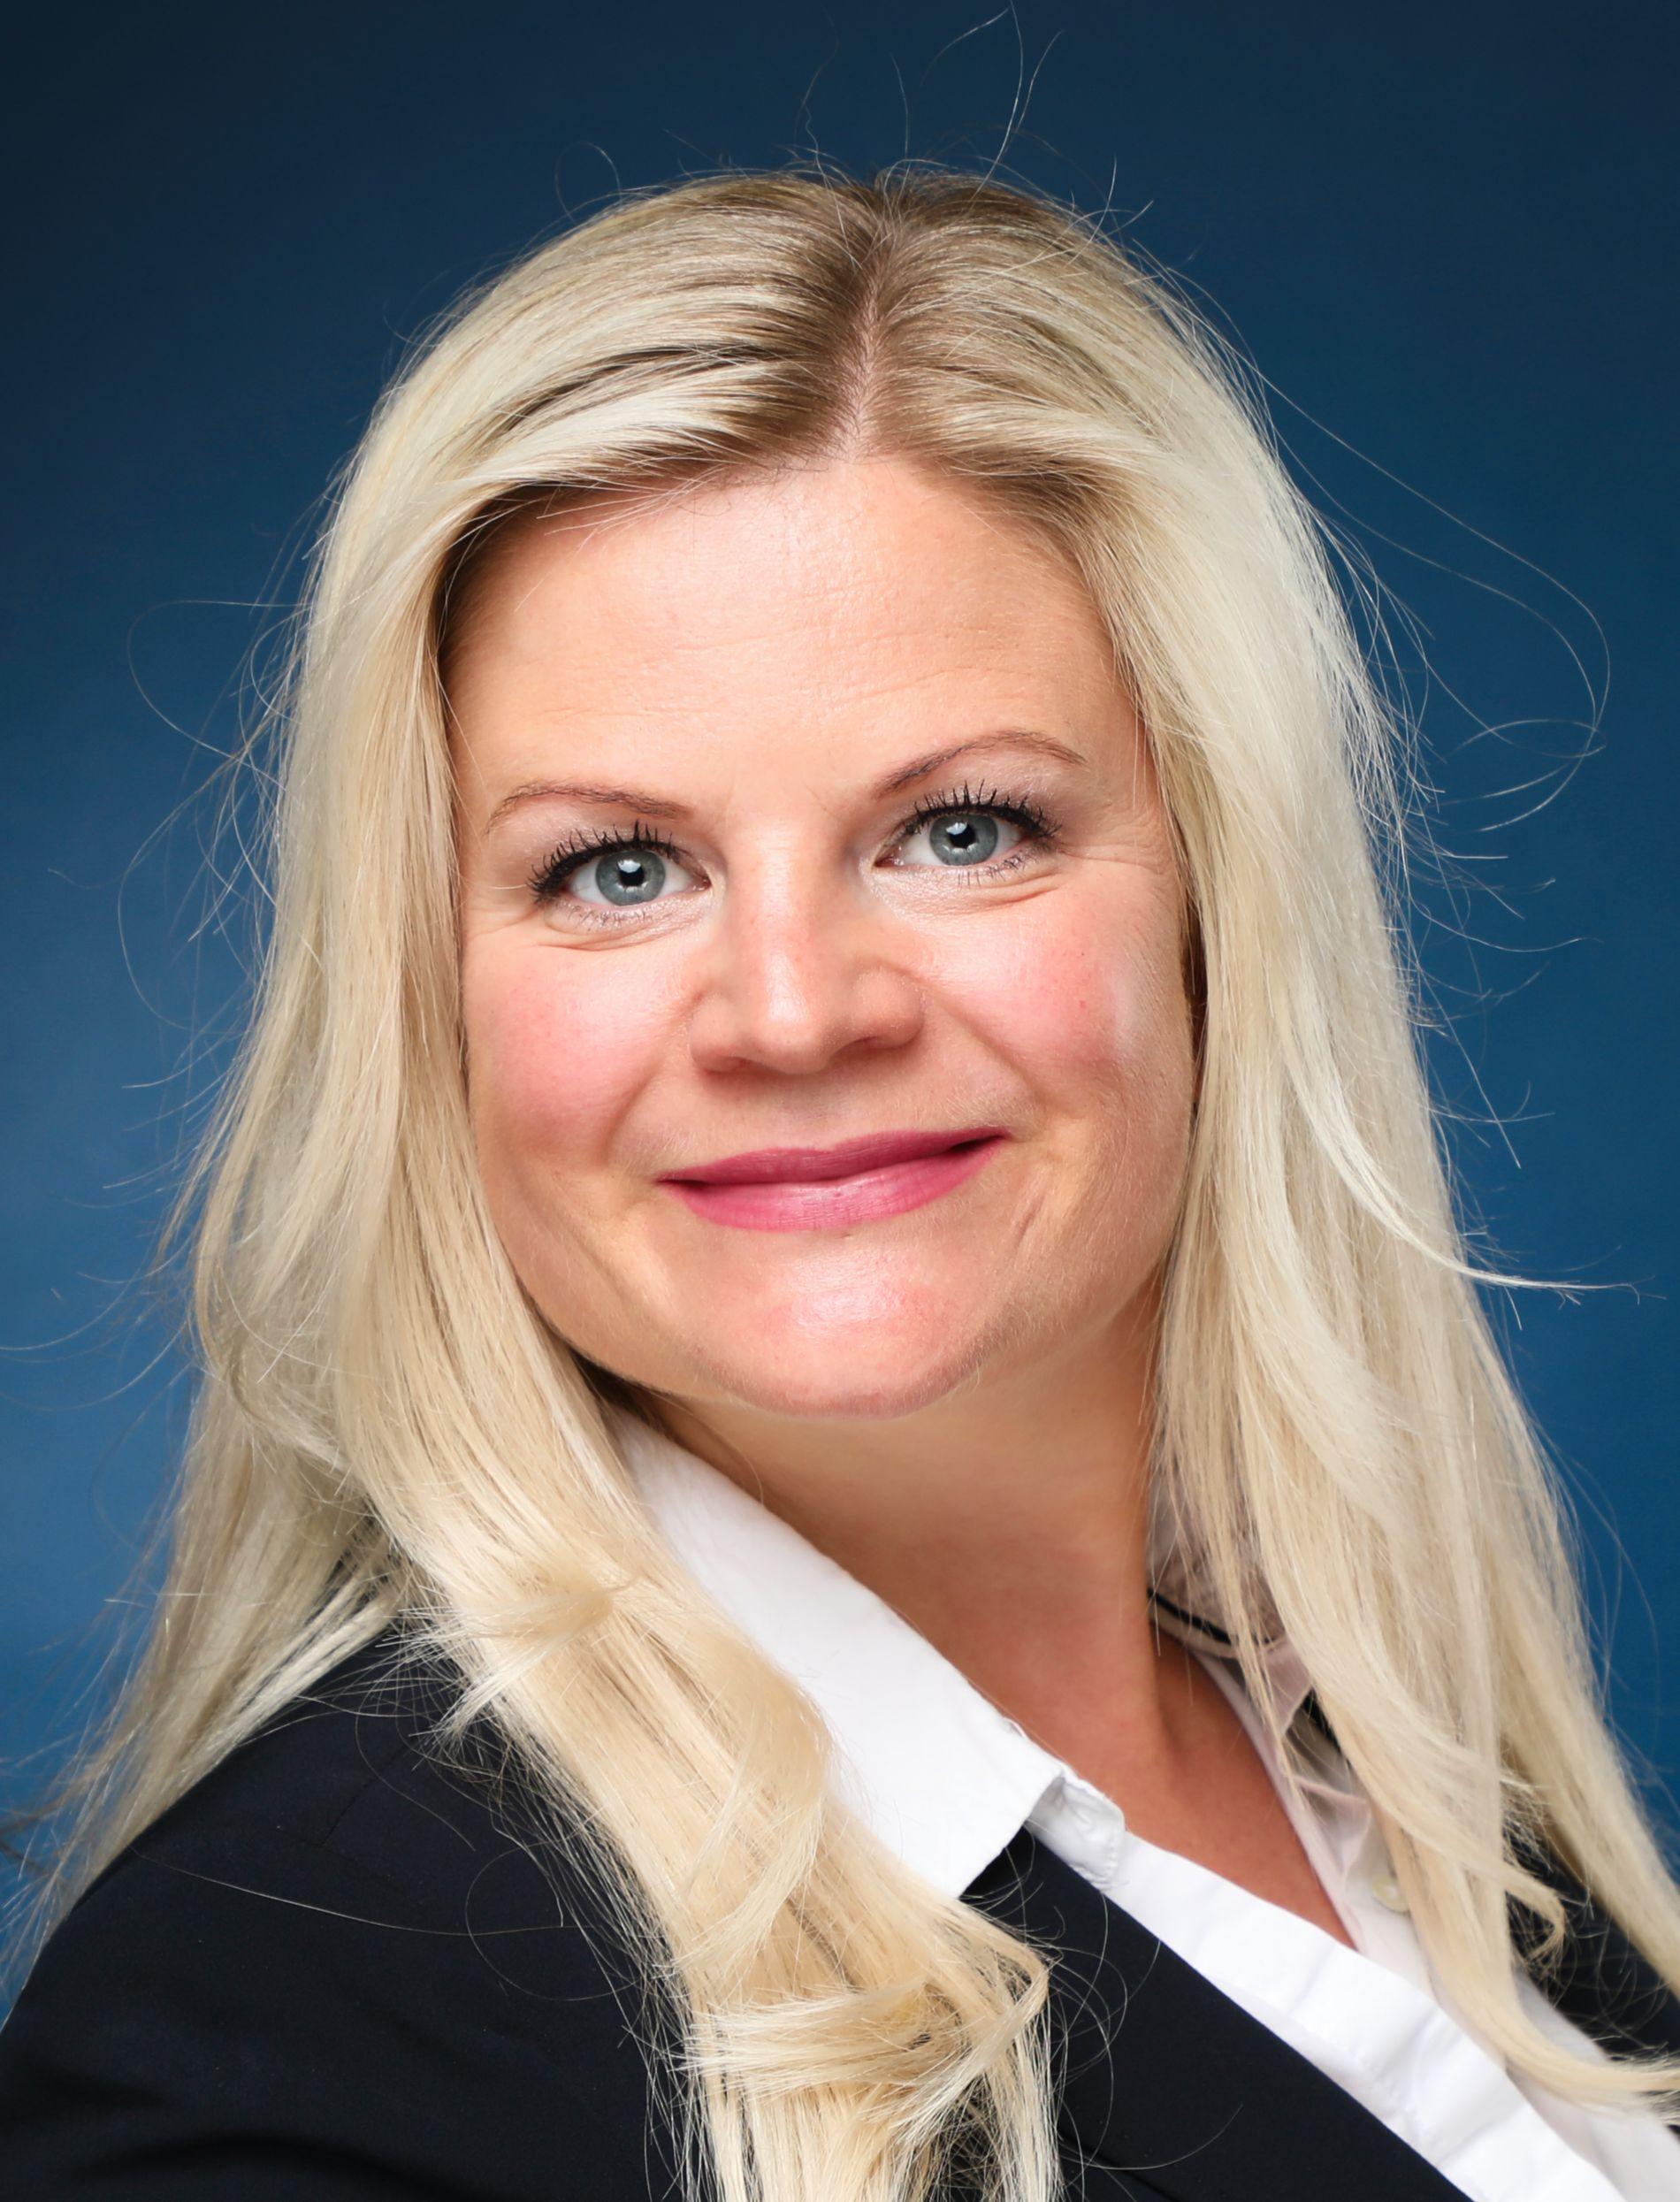 Jennifer Westholt